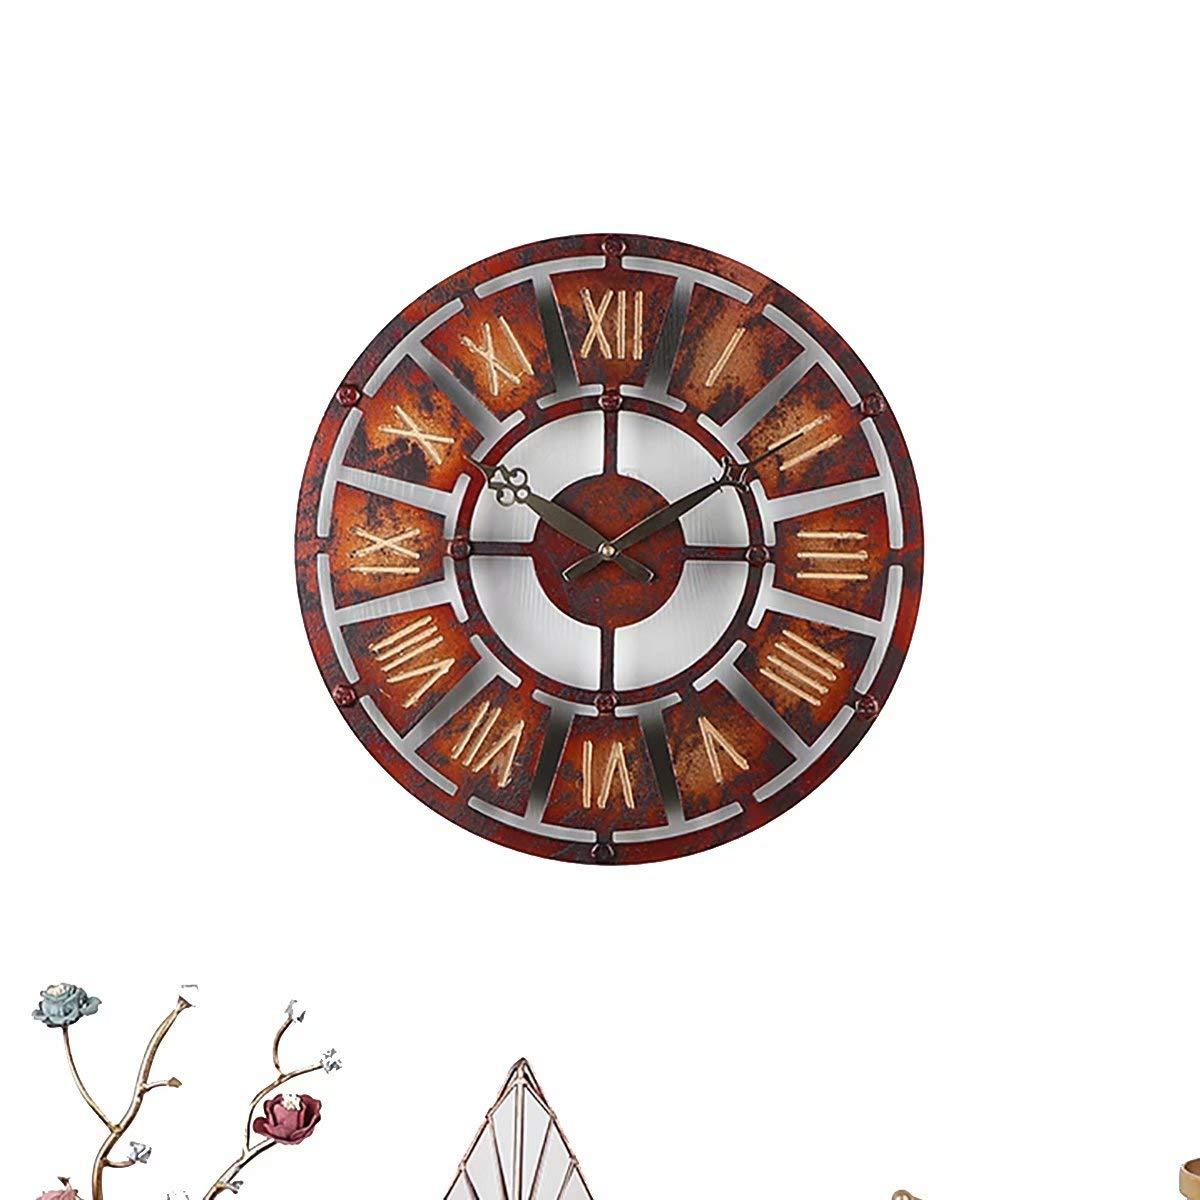 Amazon.com: BJXM Retro Gear Clocks Art Mechanical Wall Clock Mute Living Room Nostalgic Wall Hanging Industrial Wind Bar Creative Trend Restaurant Home ...